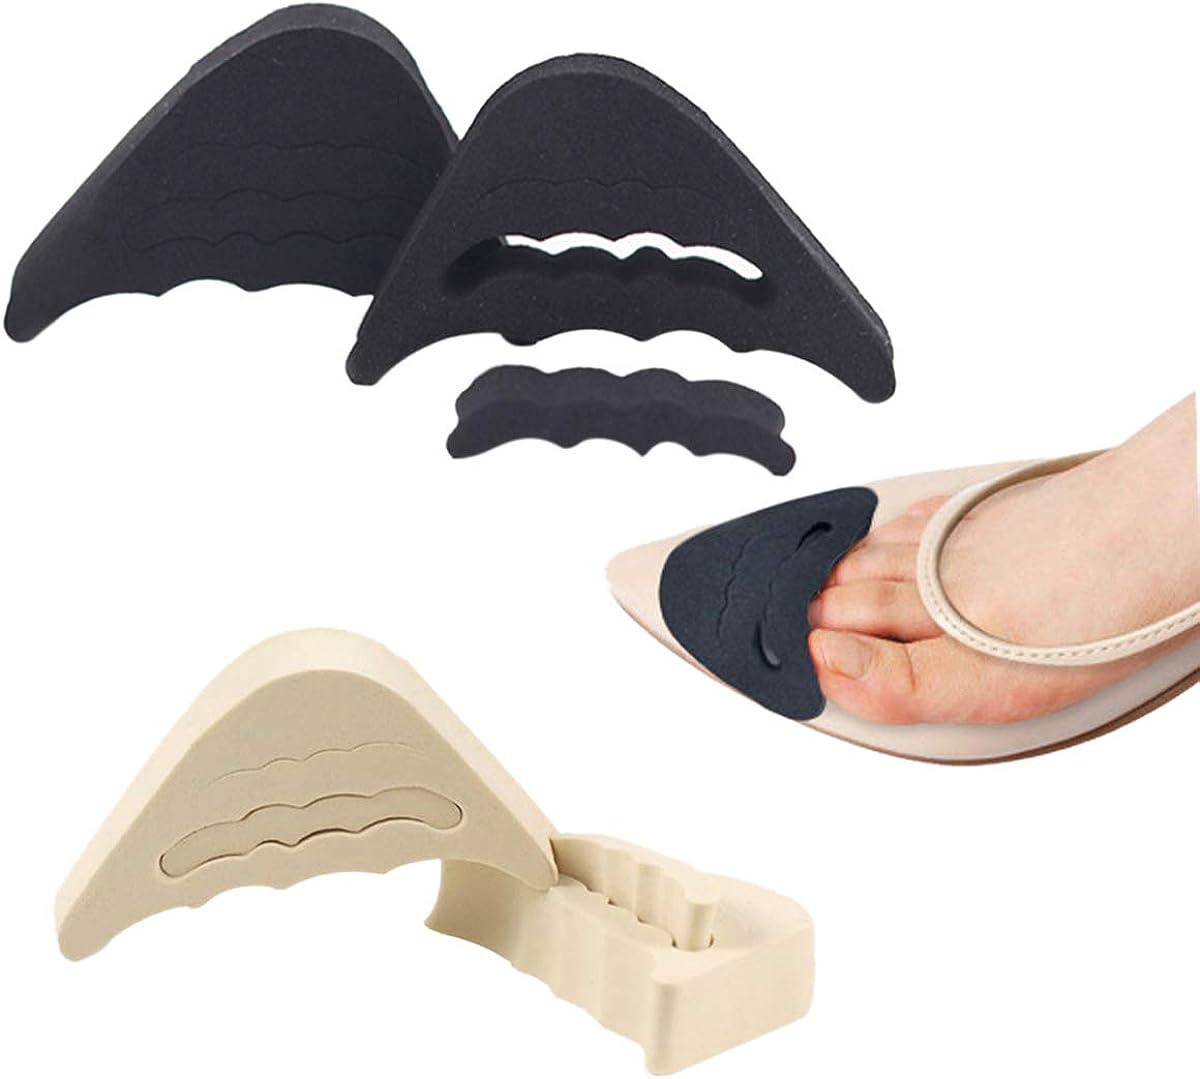 Details about  /4Pcs Shoe Filler Inserts Unisex Sponge Toe Plug Foot Brace to Make Big Shoes Fit